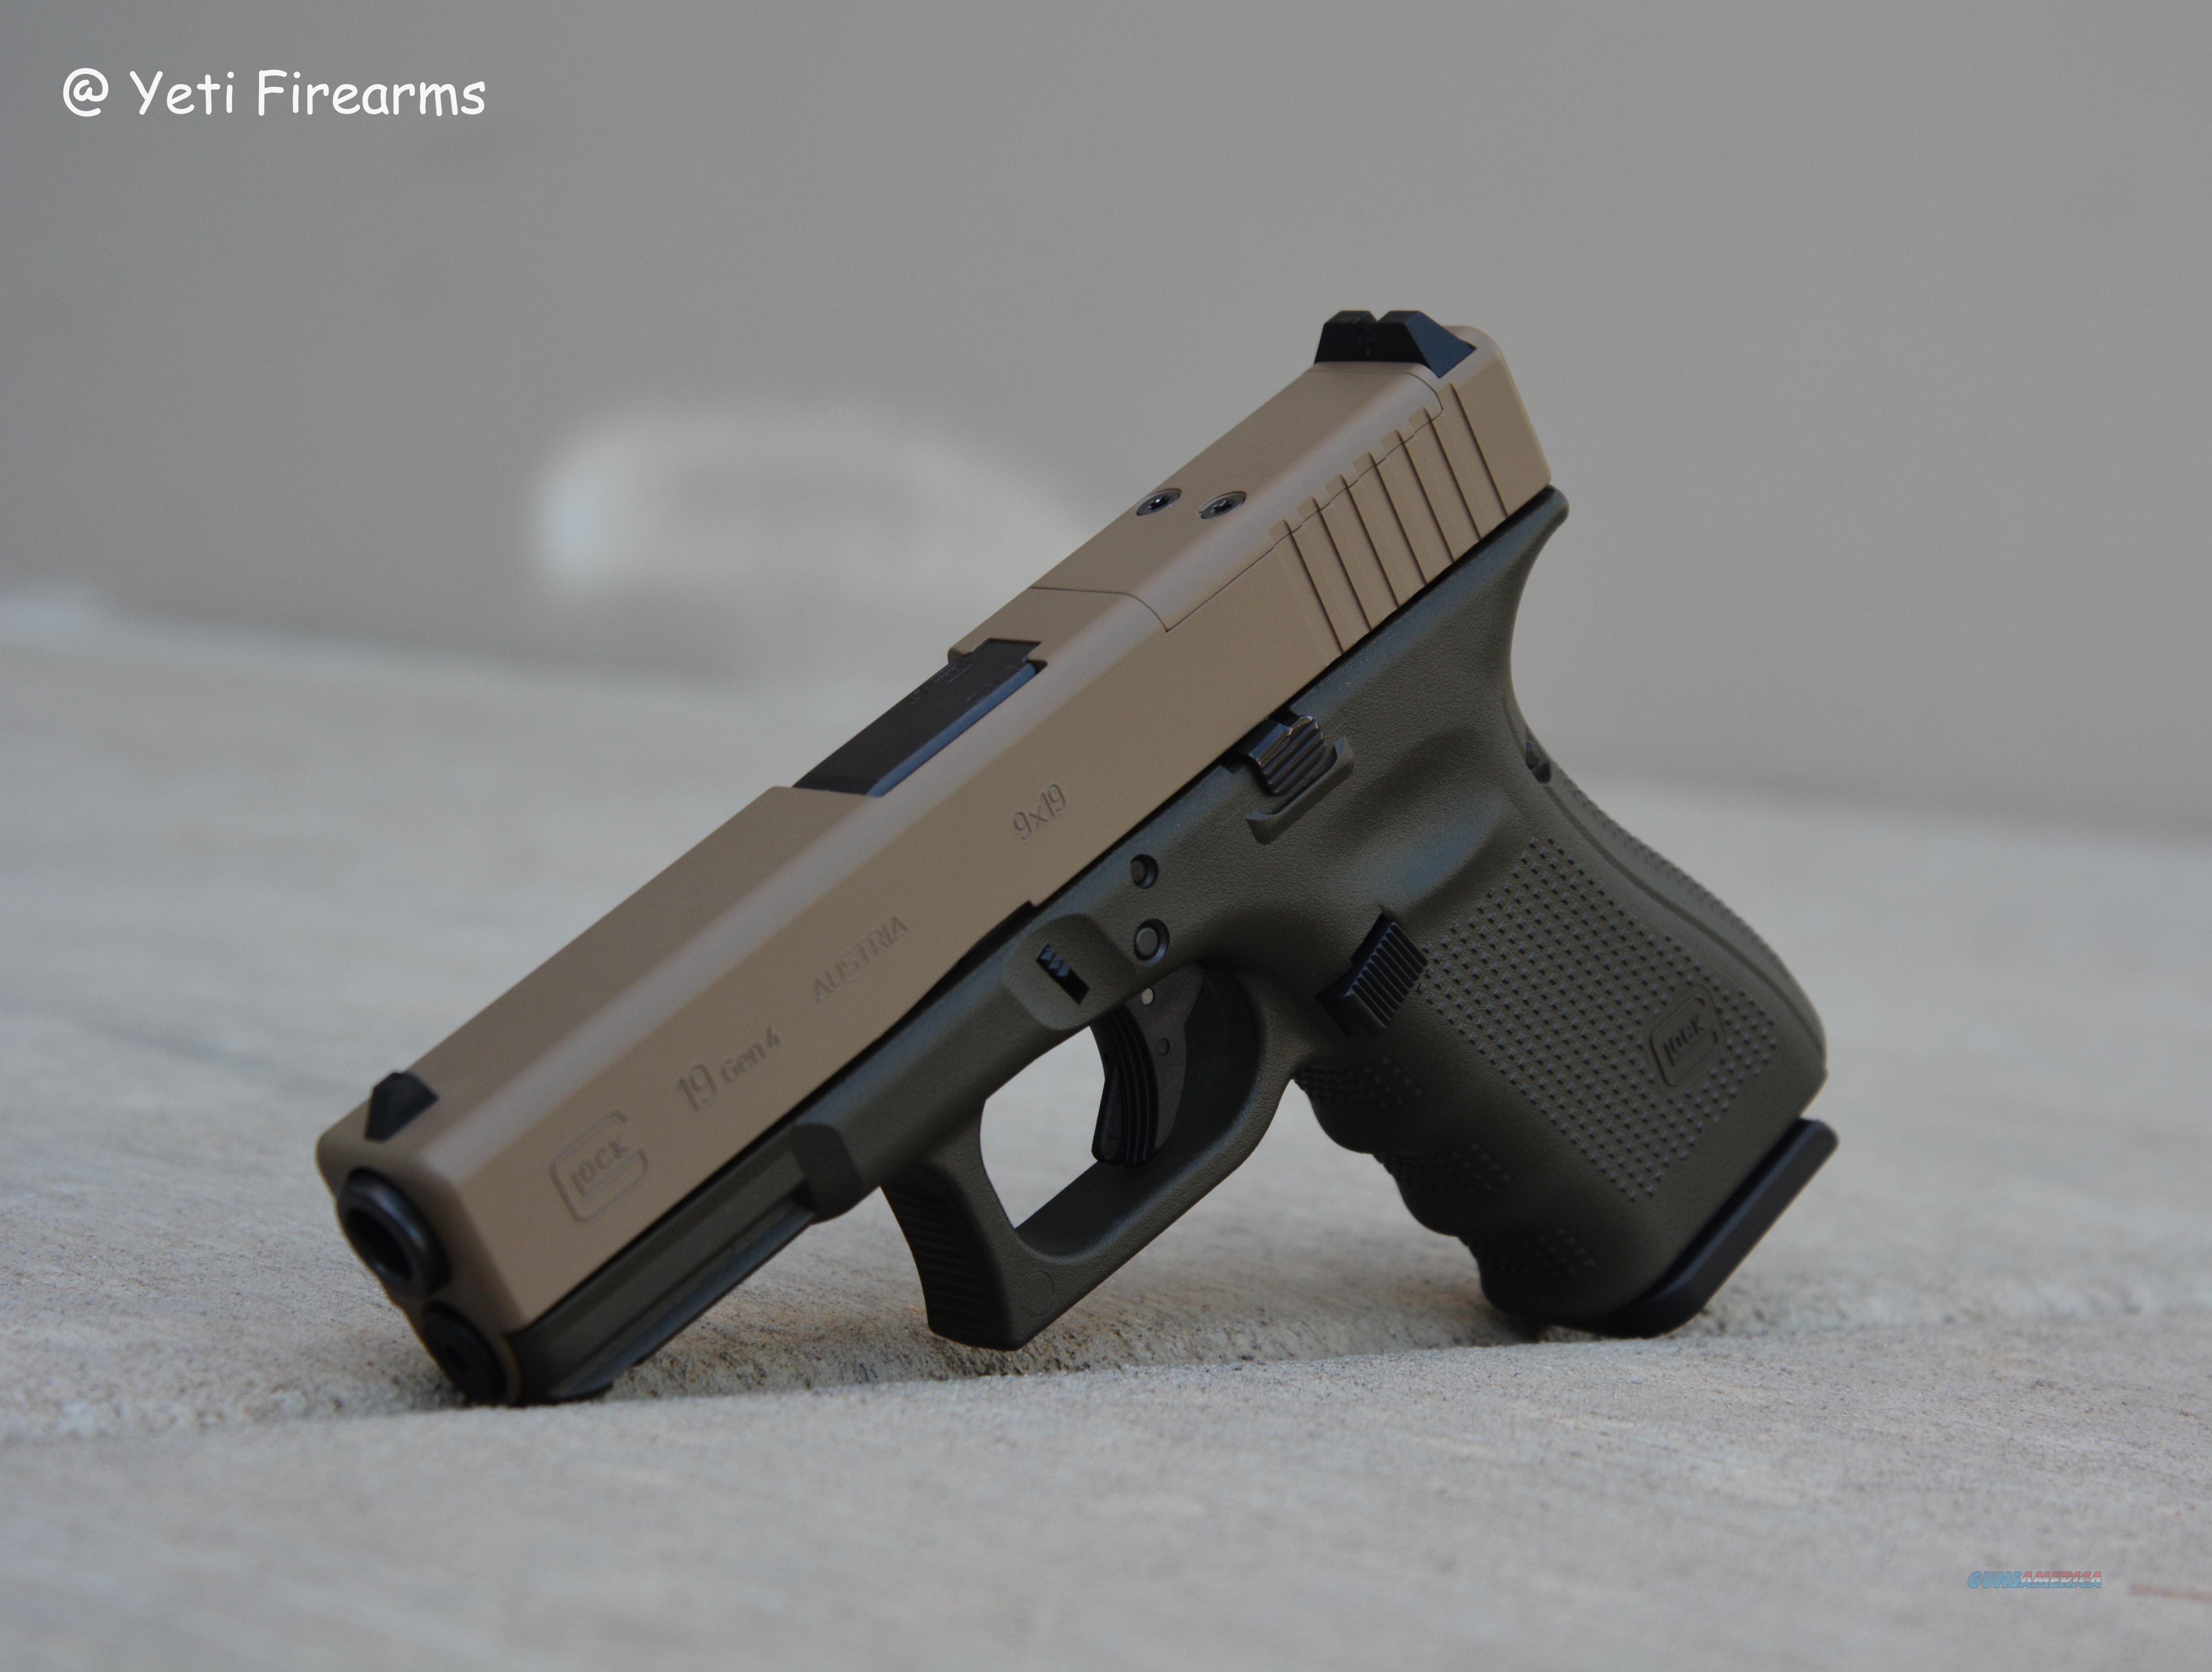 X-Werks Glock 19 G4 MOS 9mm Magpul FDE OD Gen 4